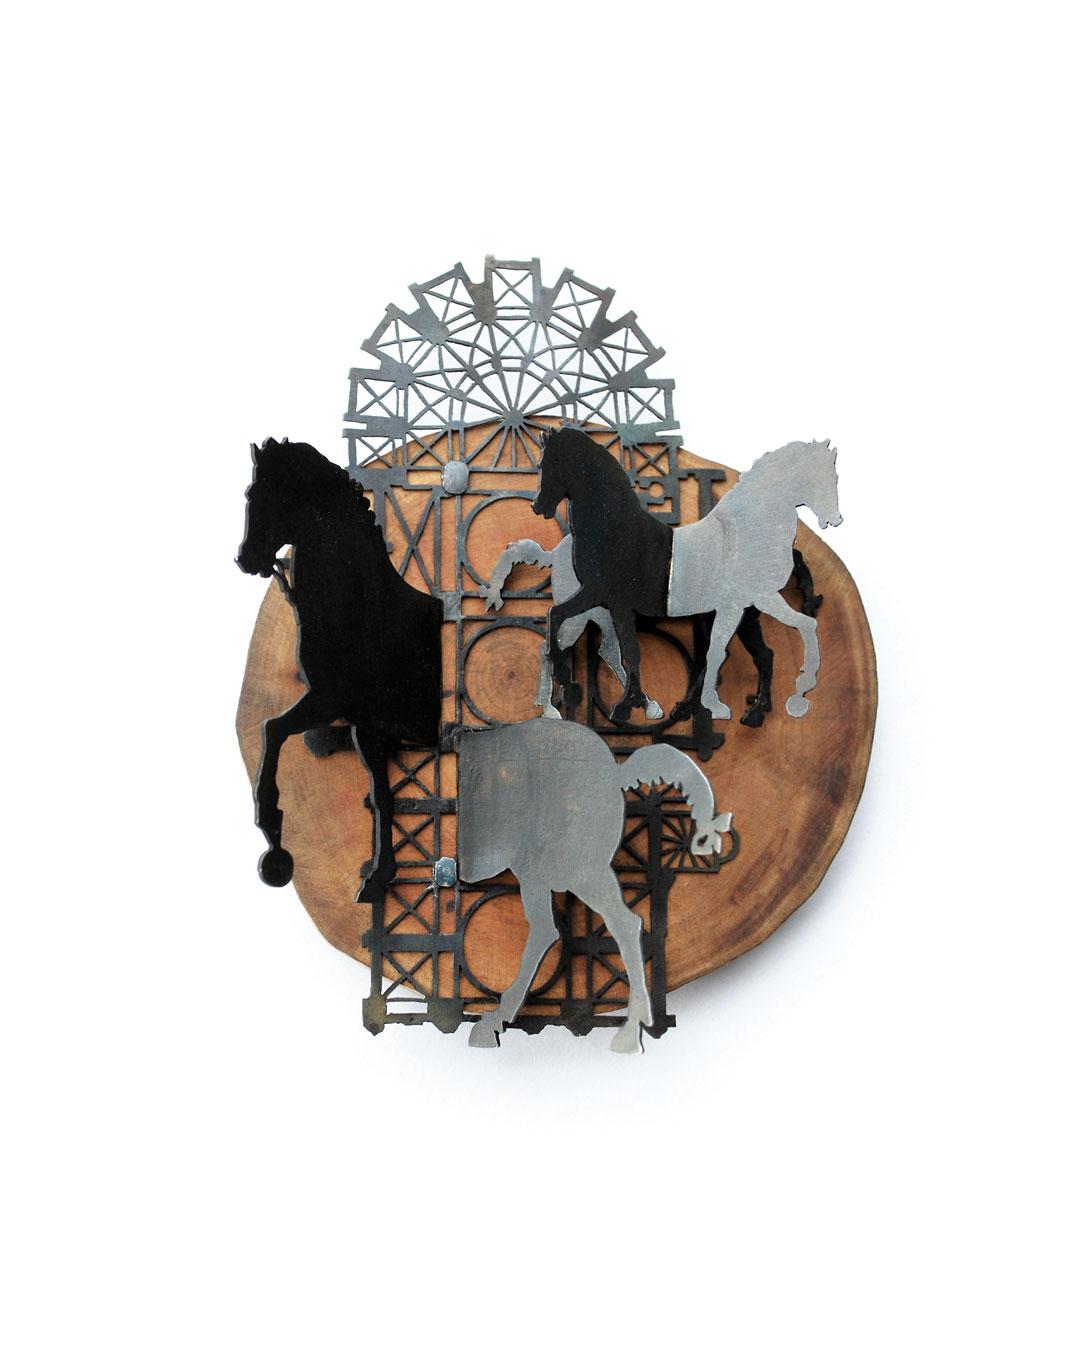 Vera Siemund, untitled, 2015, brooch; steel, wood, silver 85 x 105 x 35 mm, €1100